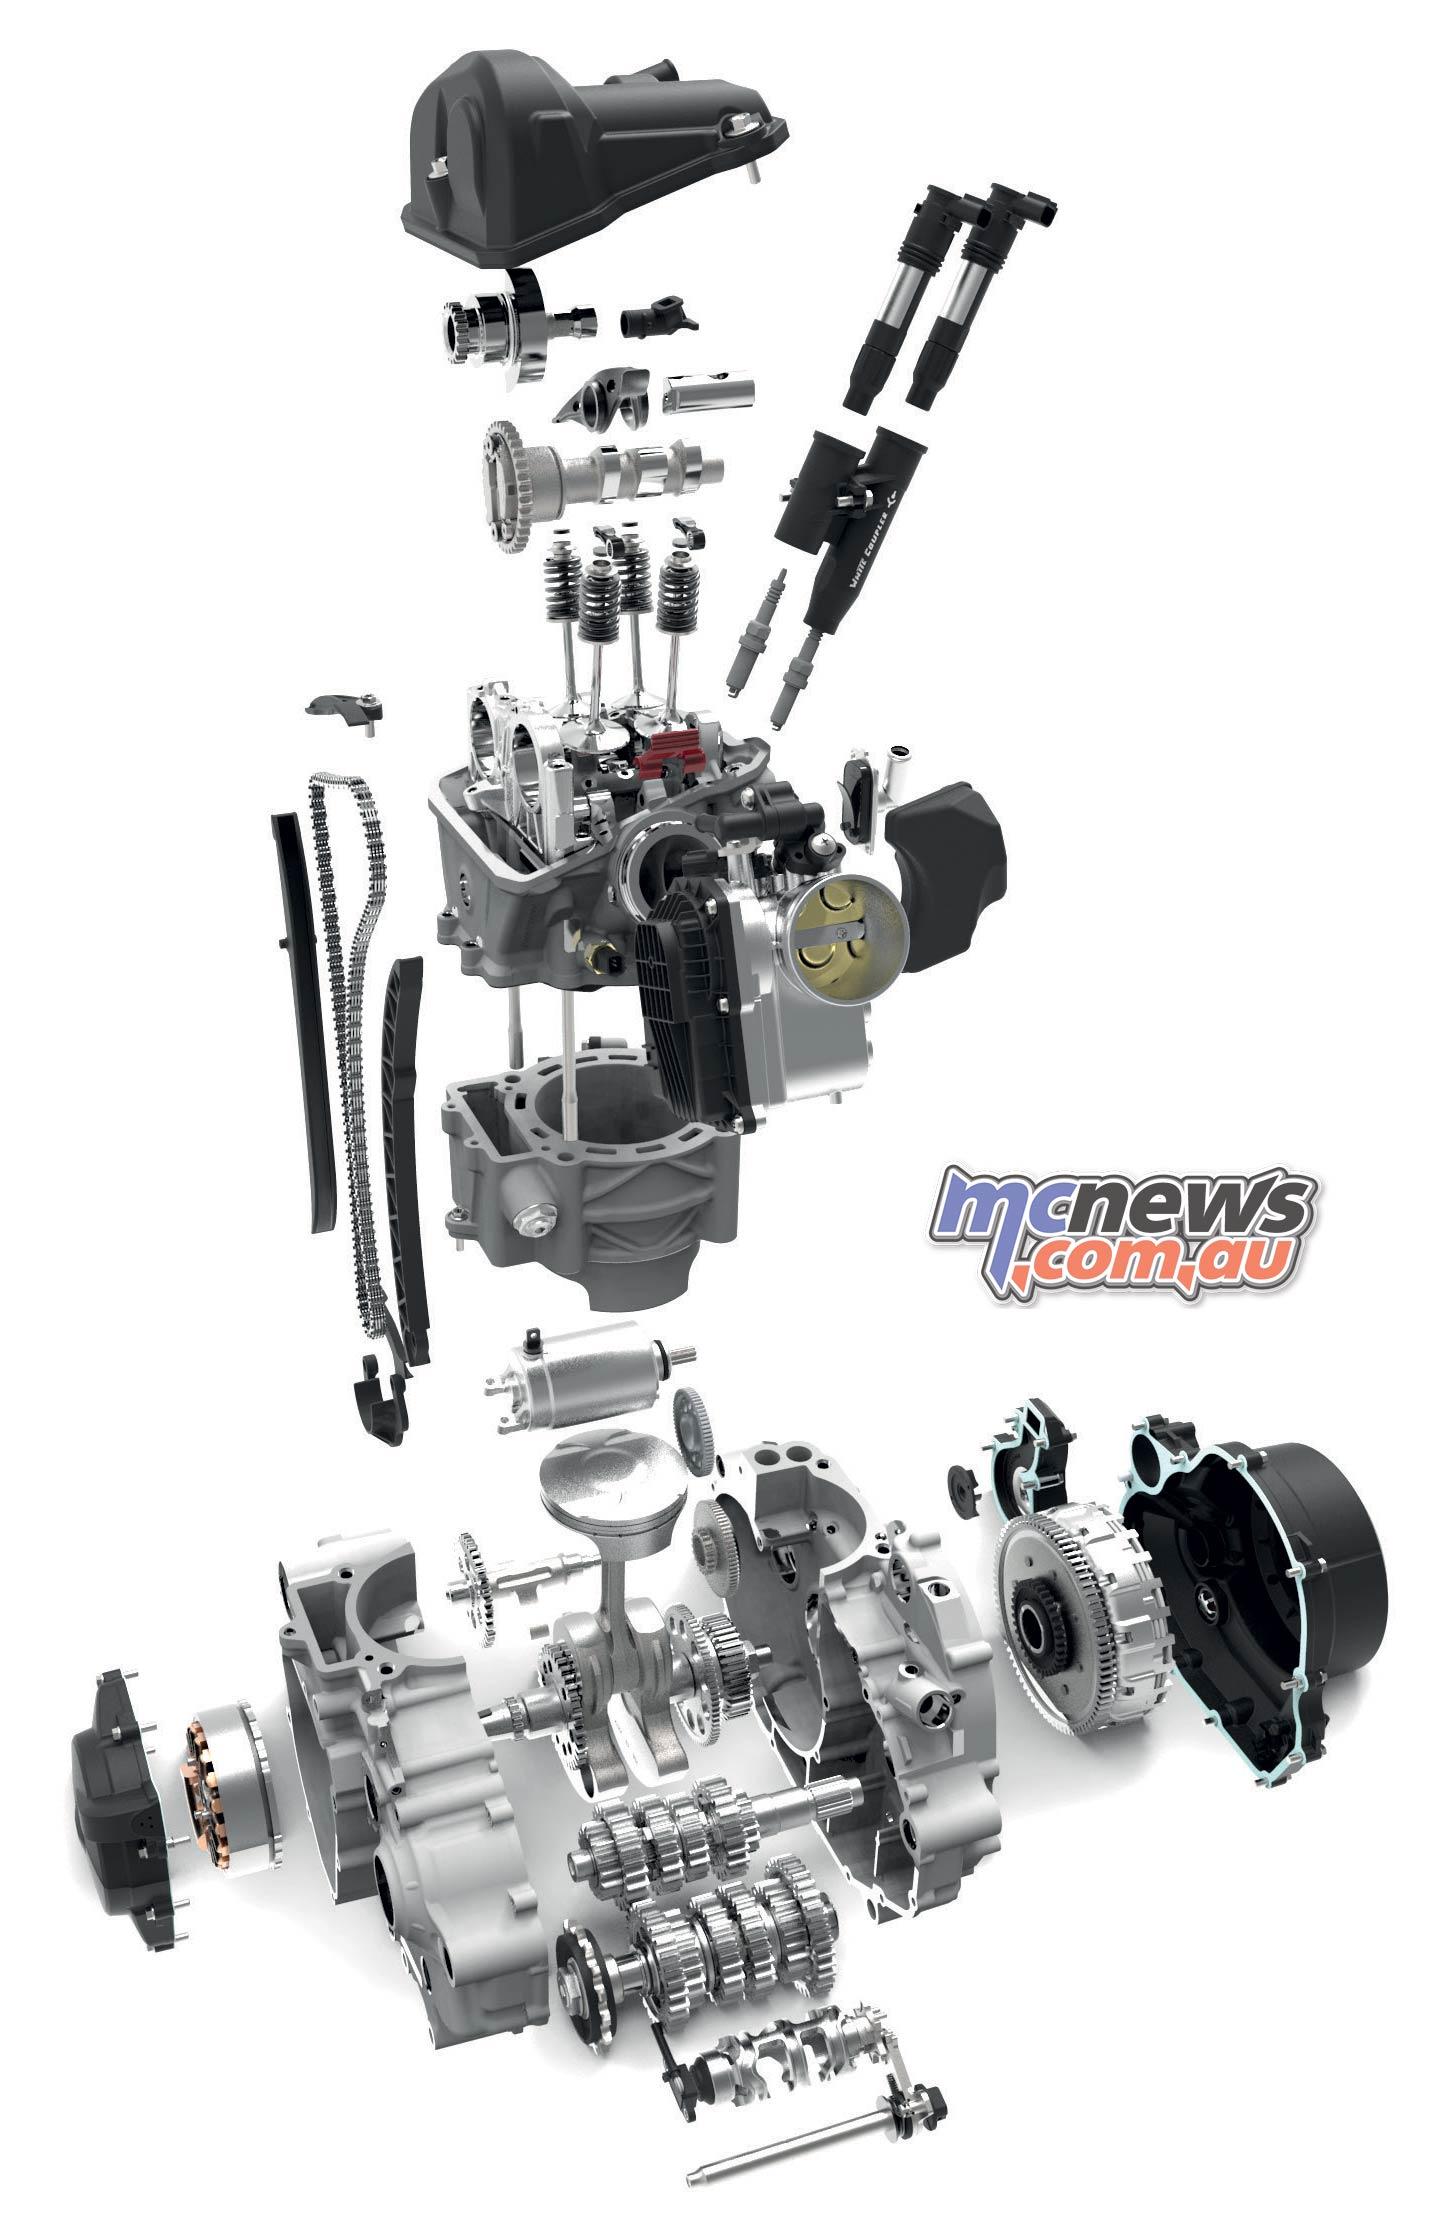 The Engine R